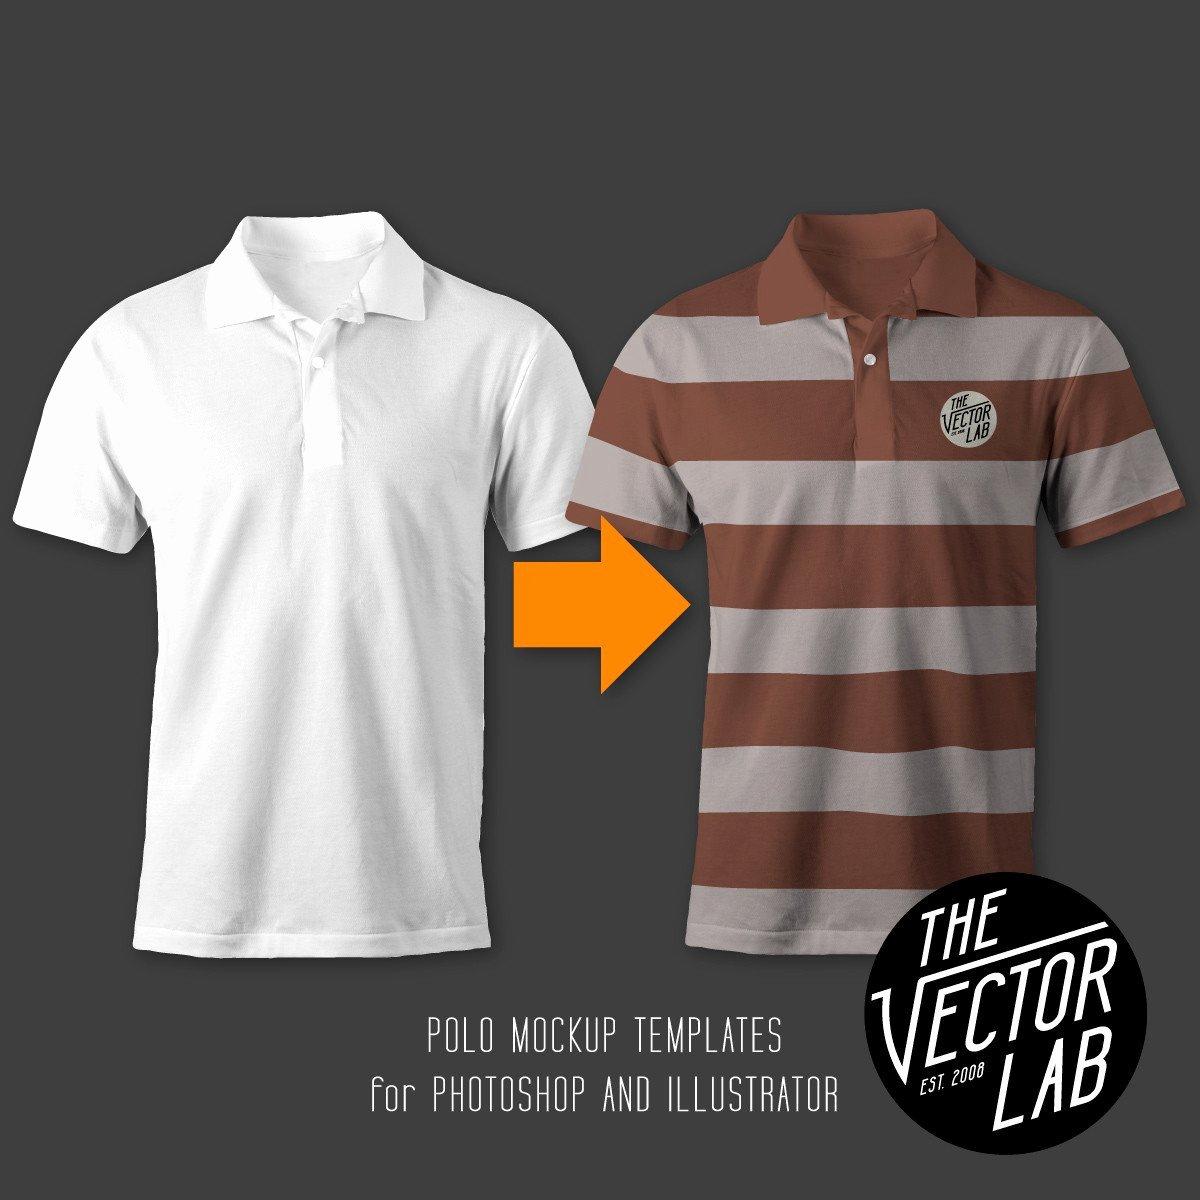 T Shirt Template Illustrator Elegant Men S Polo Mockup Templates thevectorlab